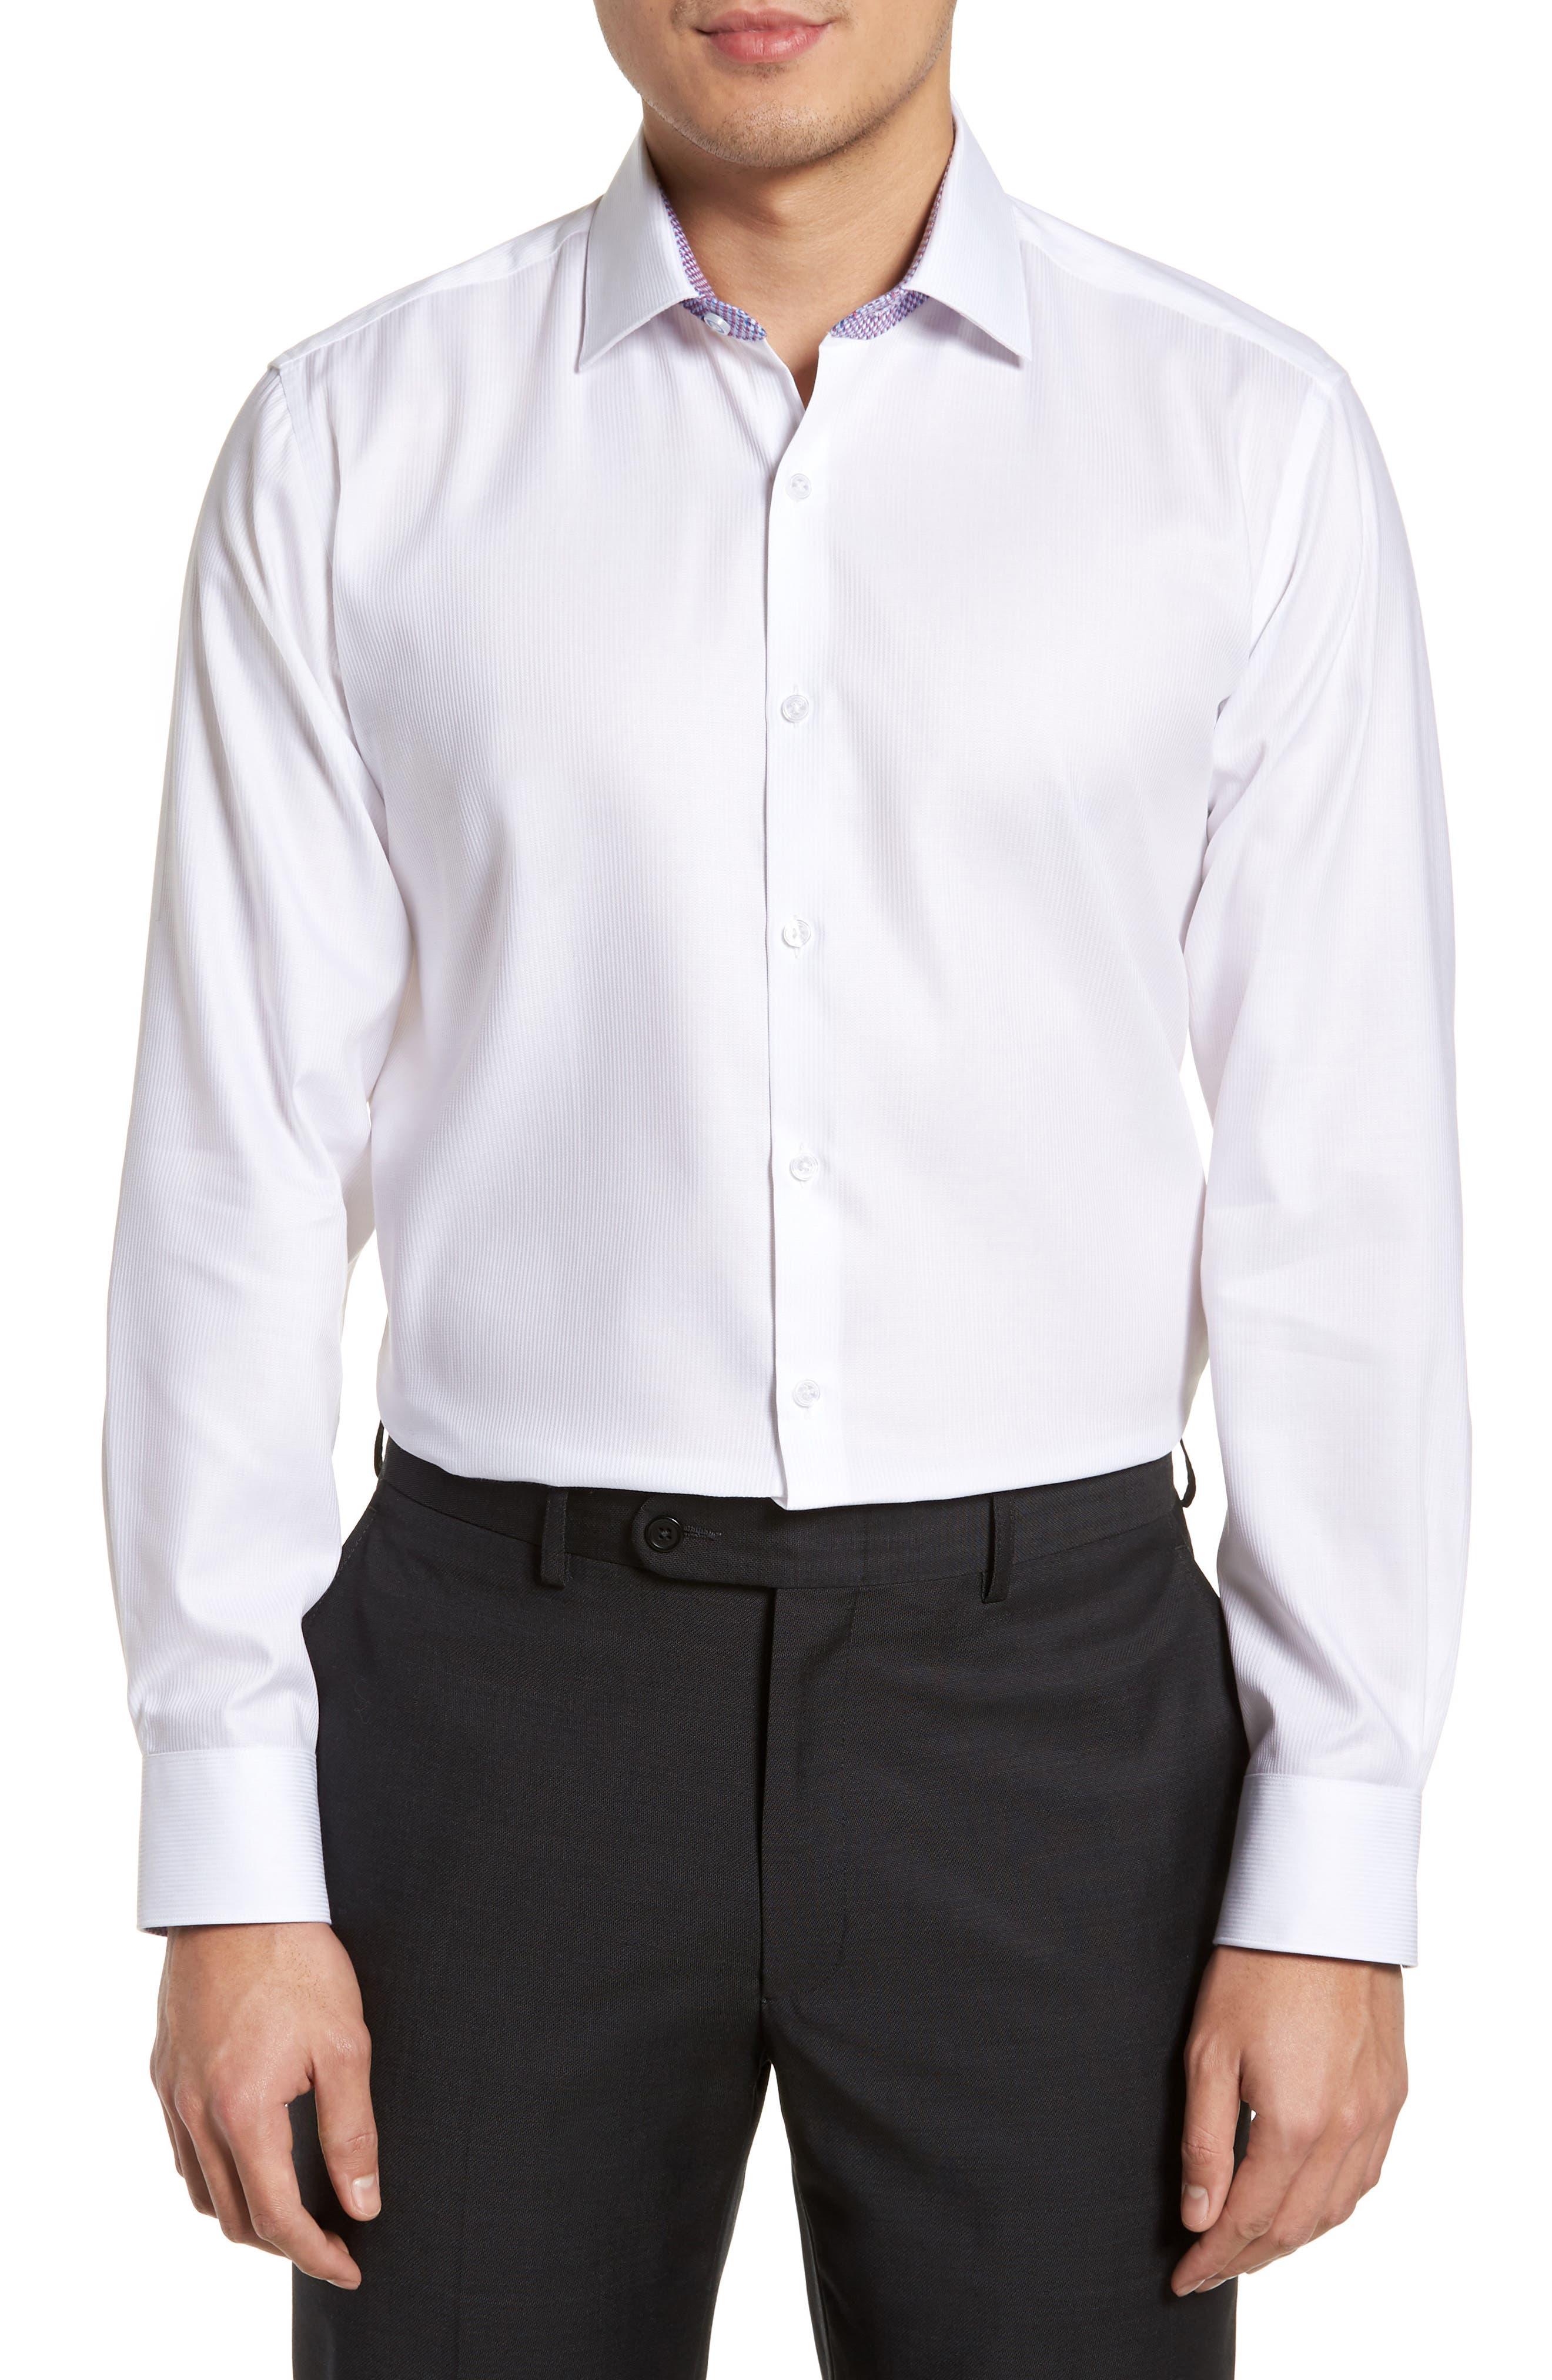 Becker Trim Fit Stripe Dress Shirt,                             Main thumbnail 1, color,                             White